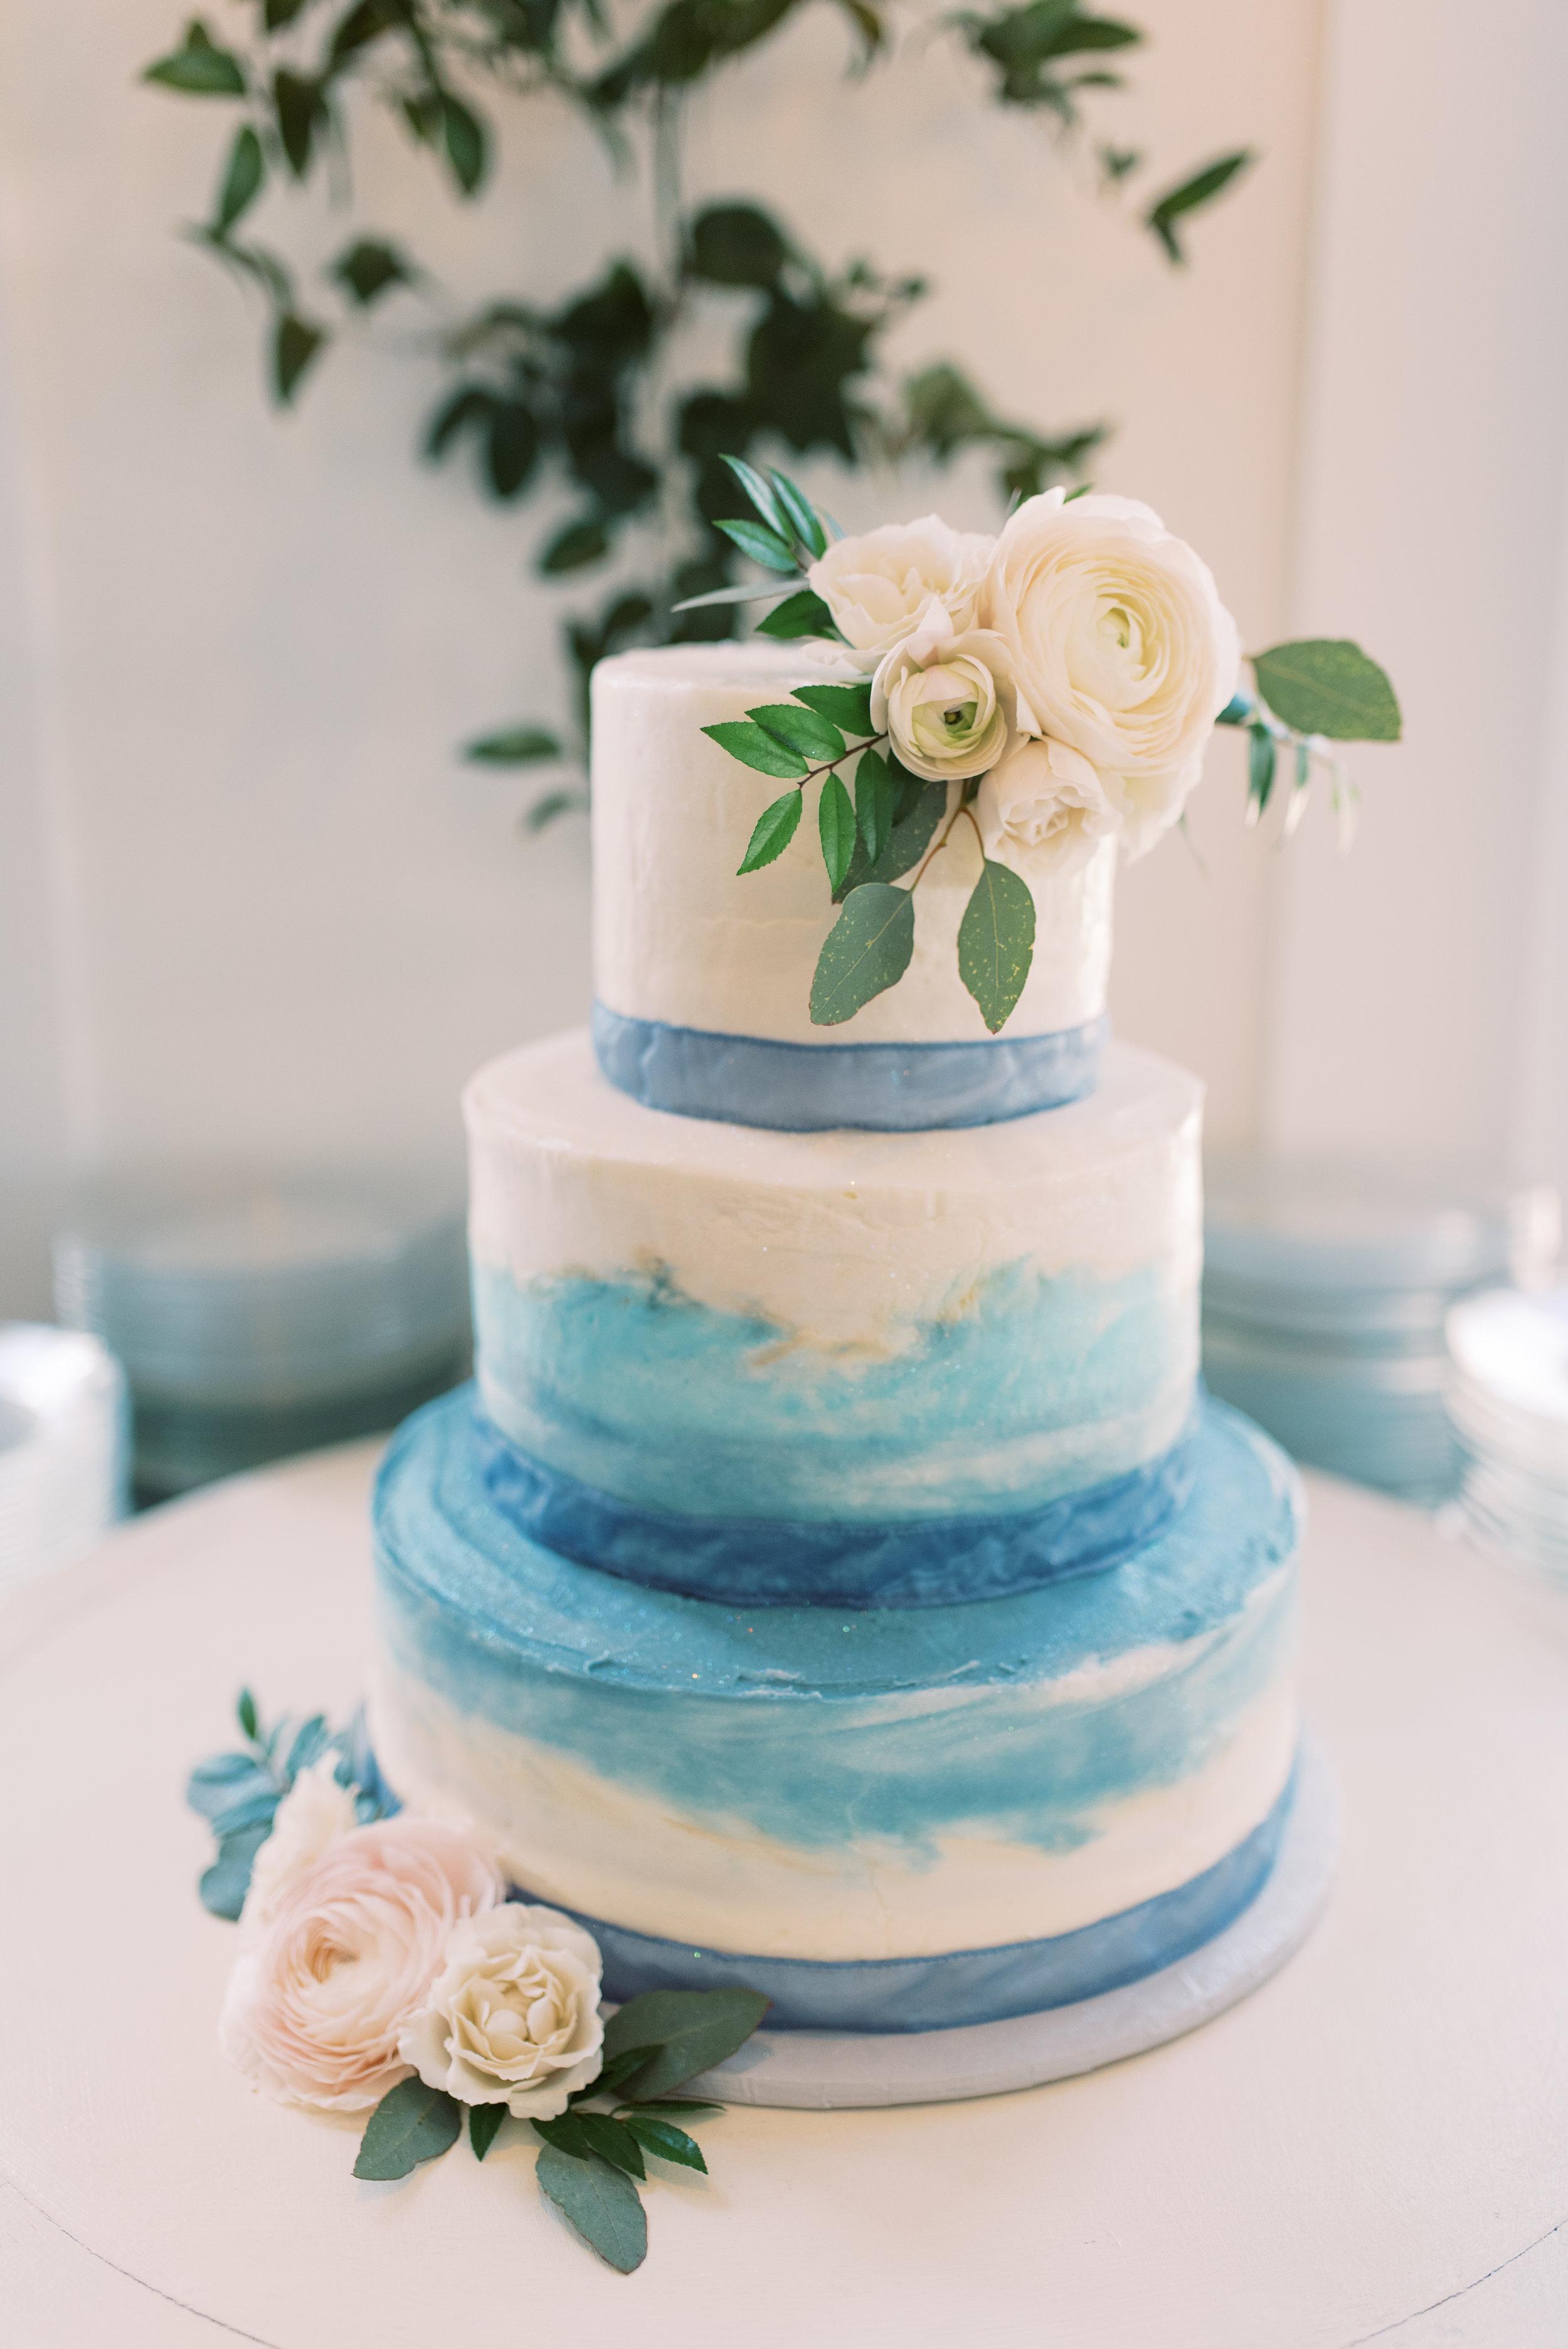 Meredith_Cody_marblegate_Farm_Wedding_Knoxville_TN_Abigail_Malone_Photography-387.jpg